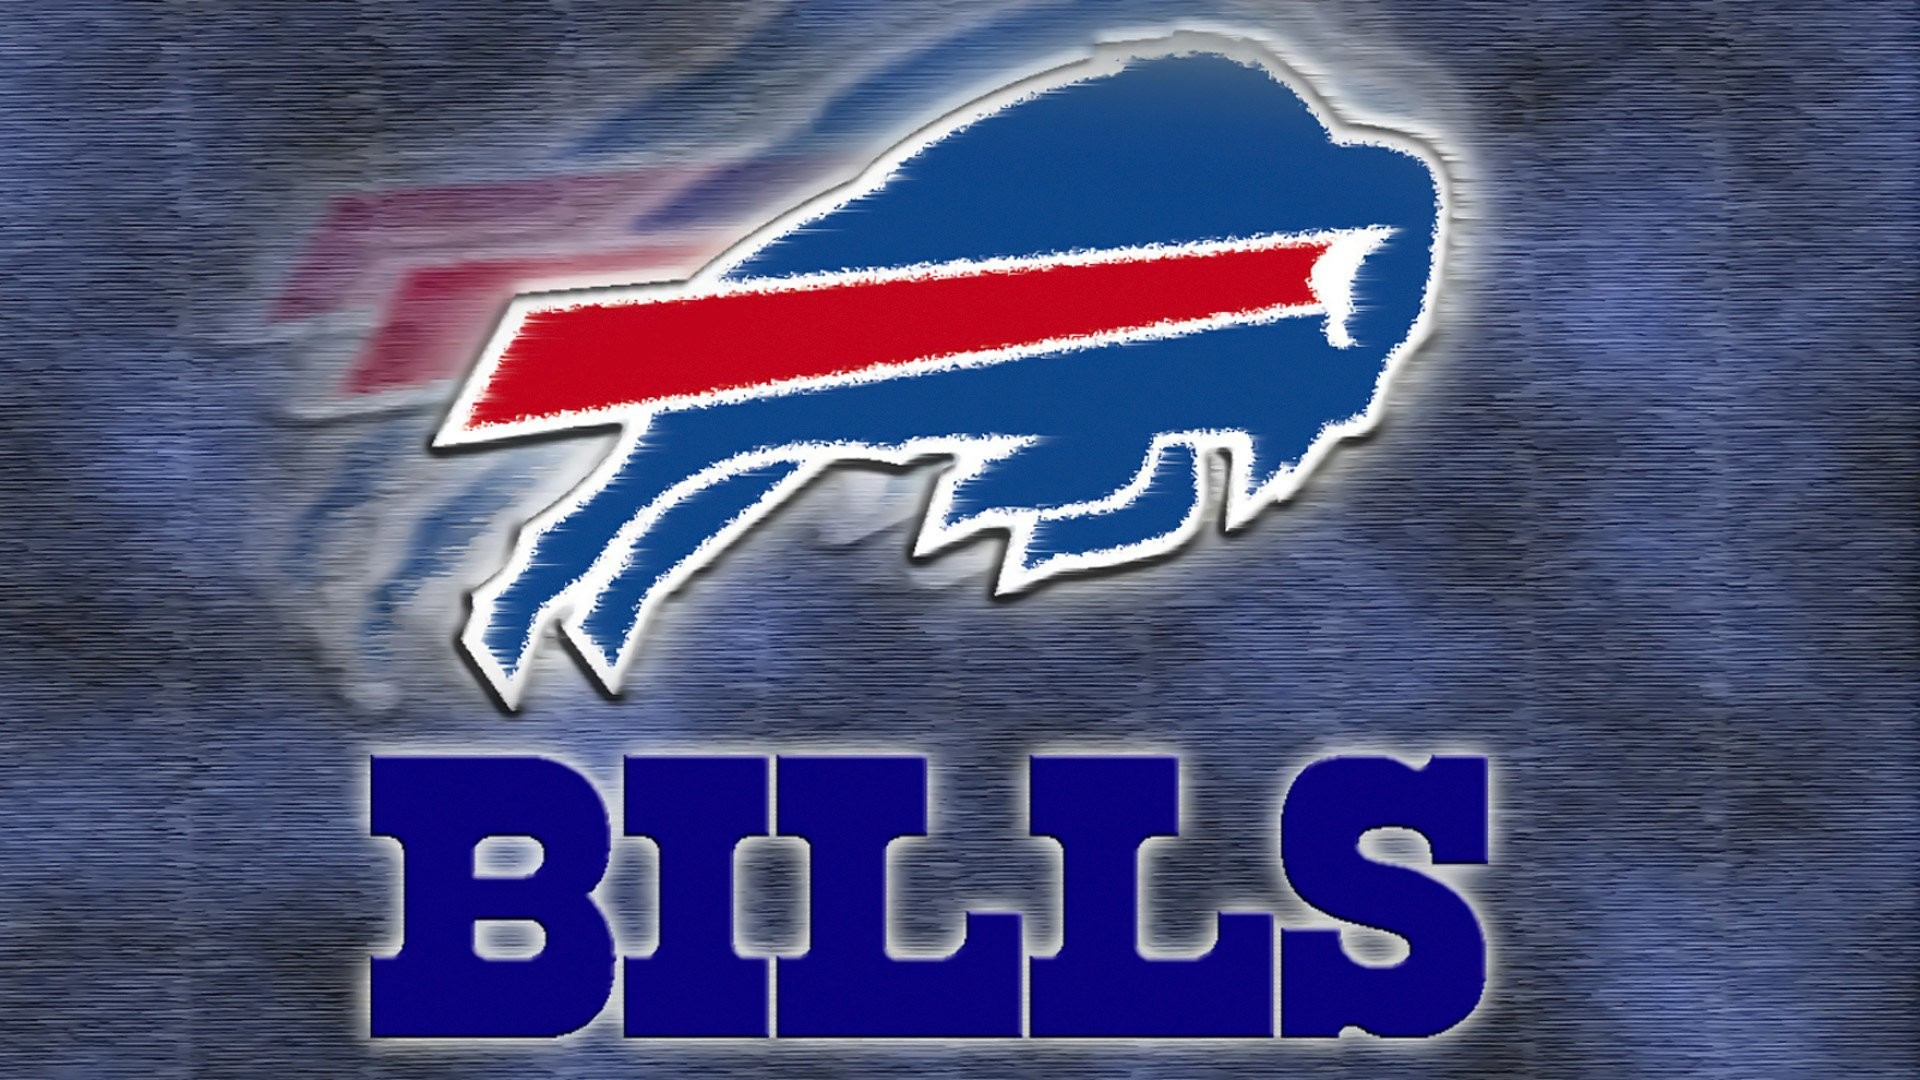 … wallpapers feelgrph; buffalo bills logo walldevil …